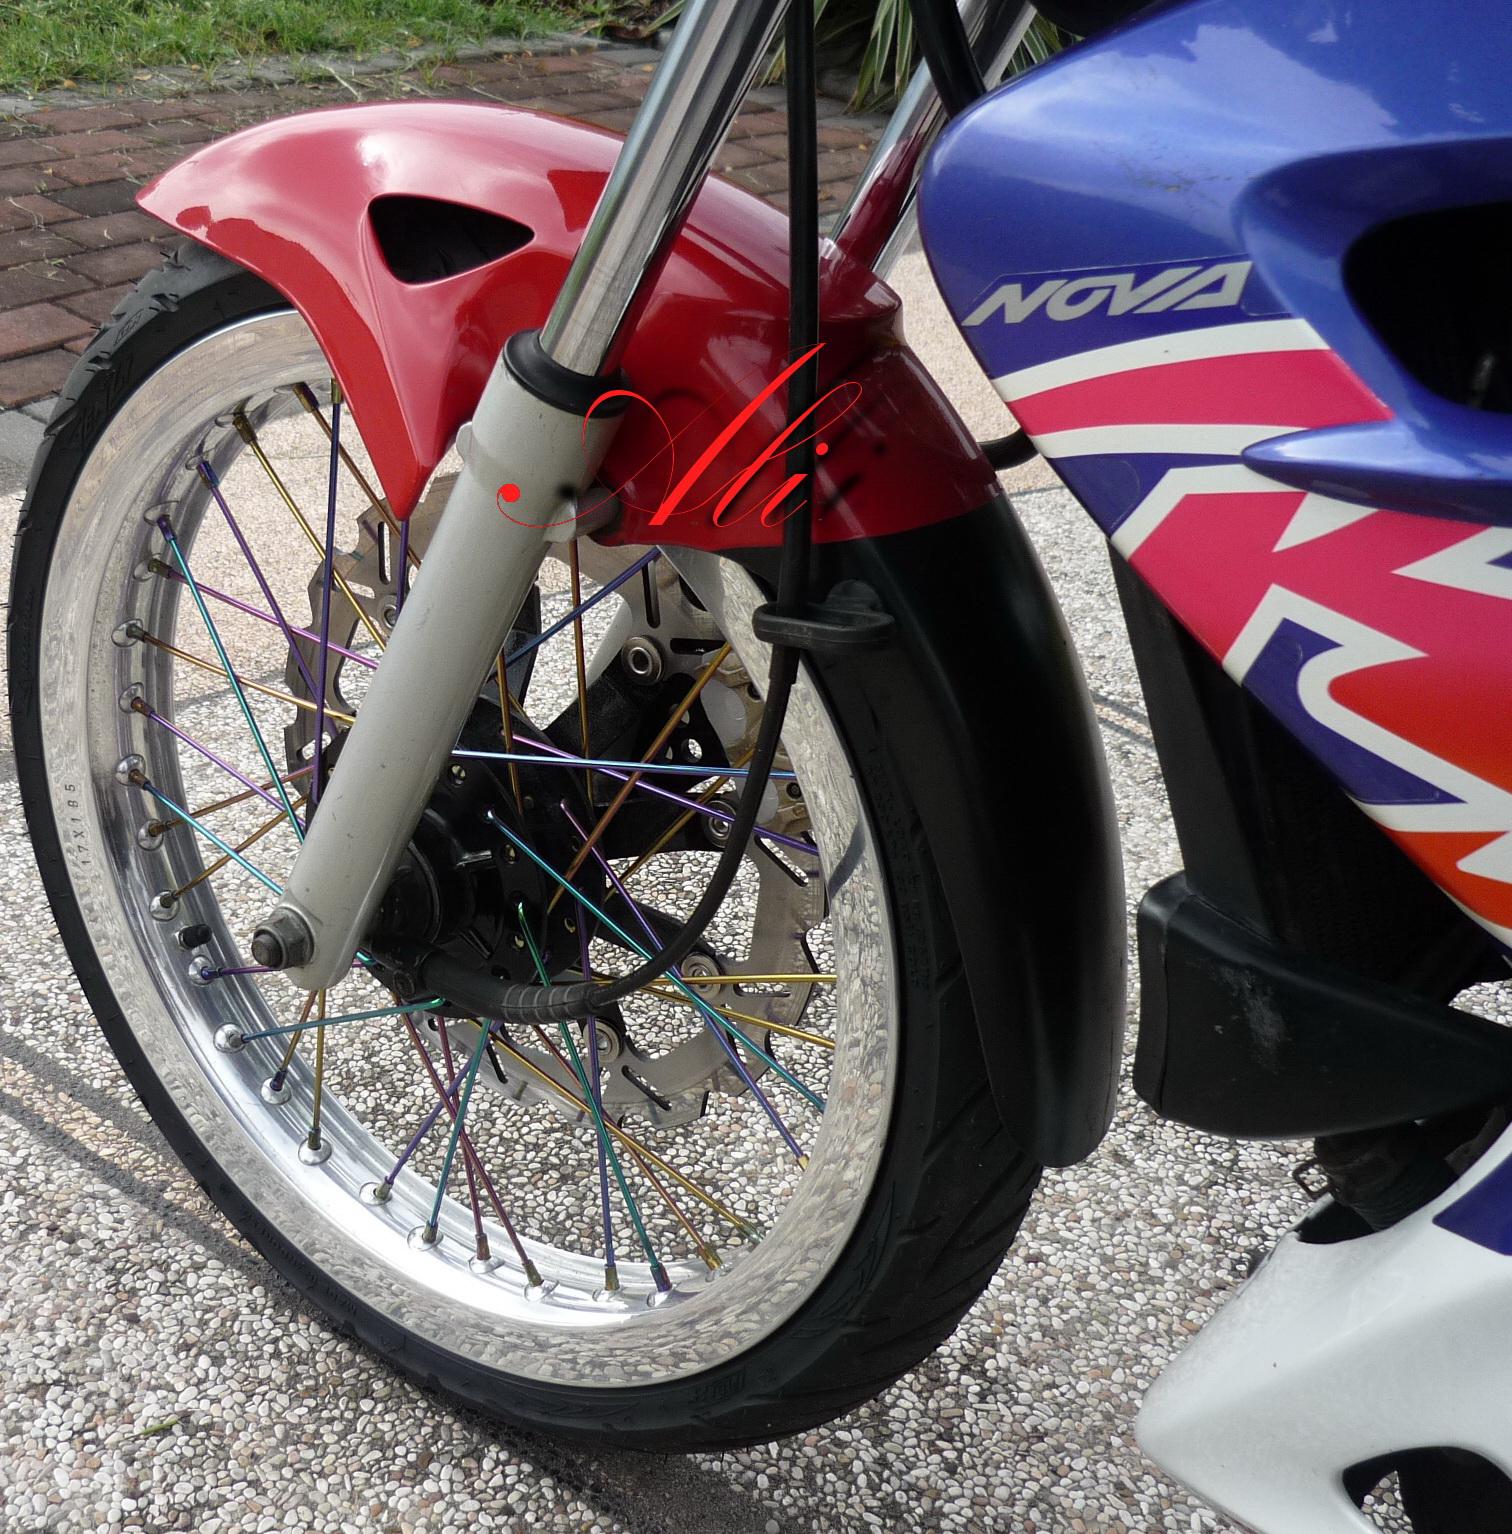 Honda Dash 125 – Daily Motivational Quotes